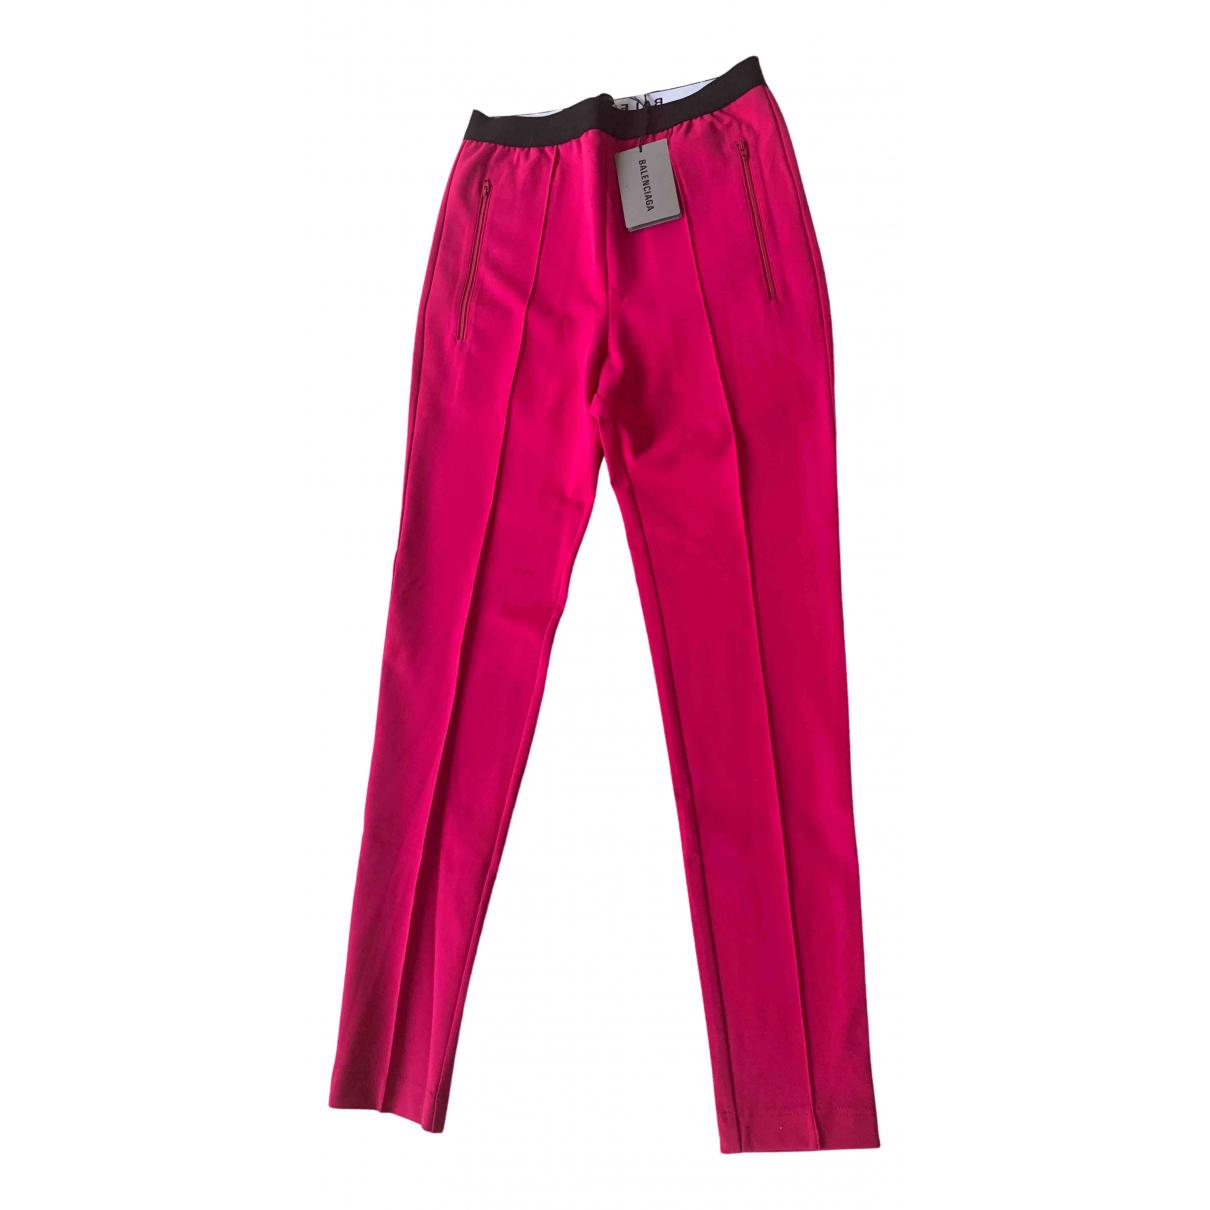 Balenciaga N Pink Trousers for Women 40 FR